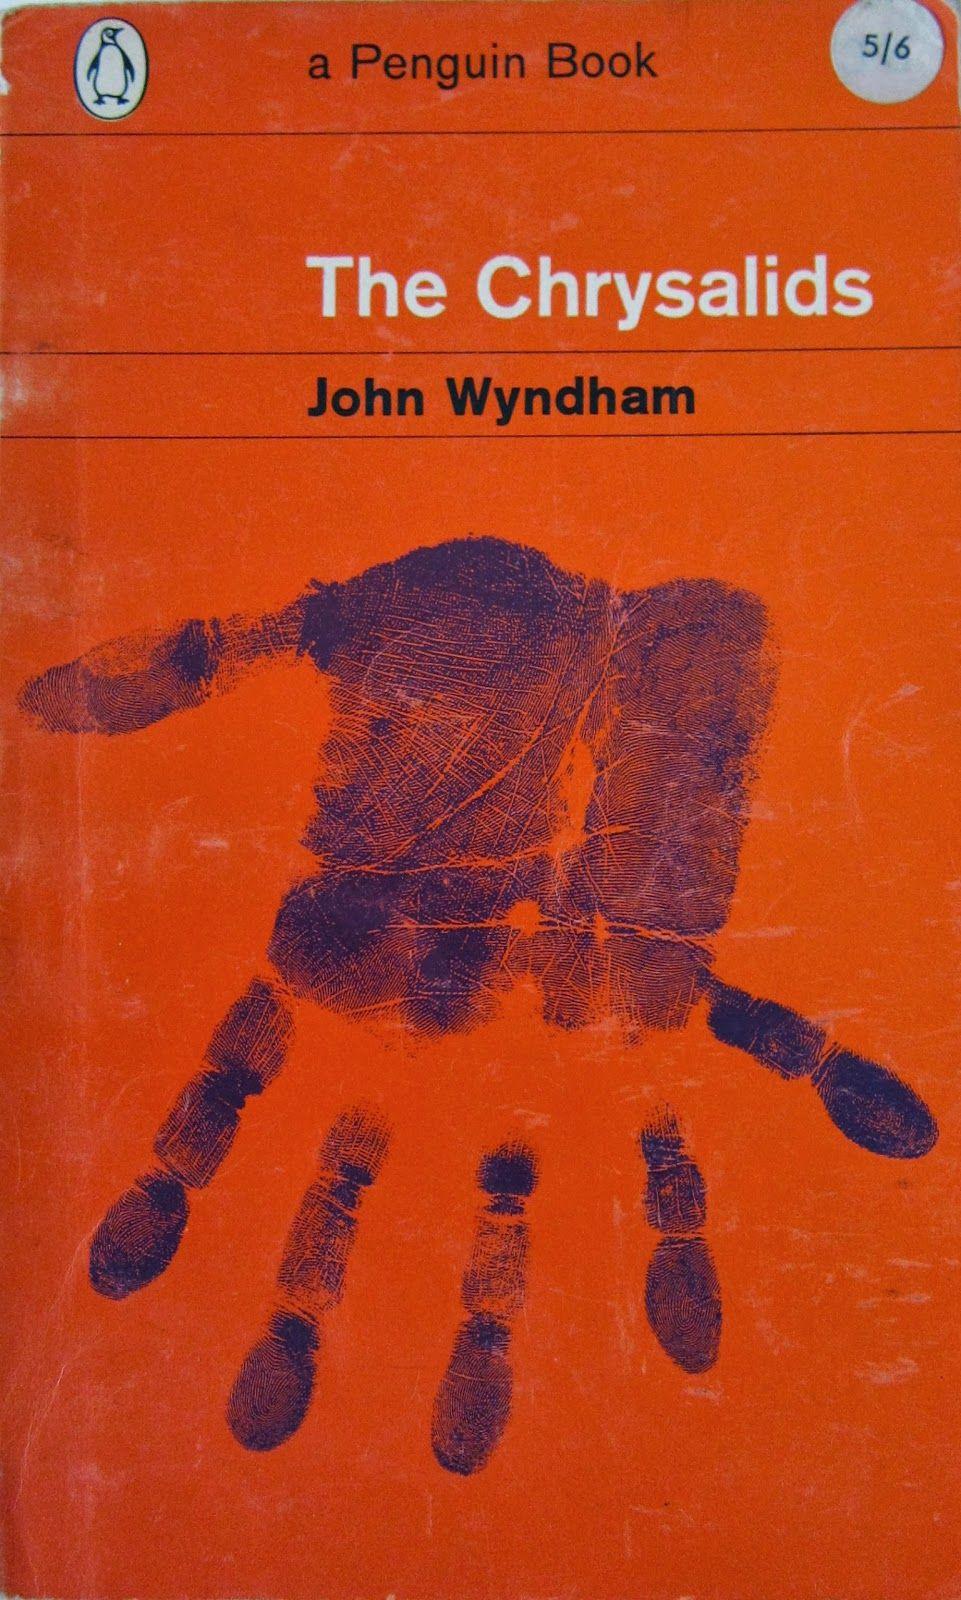 The Chrysalids – John Wyndham